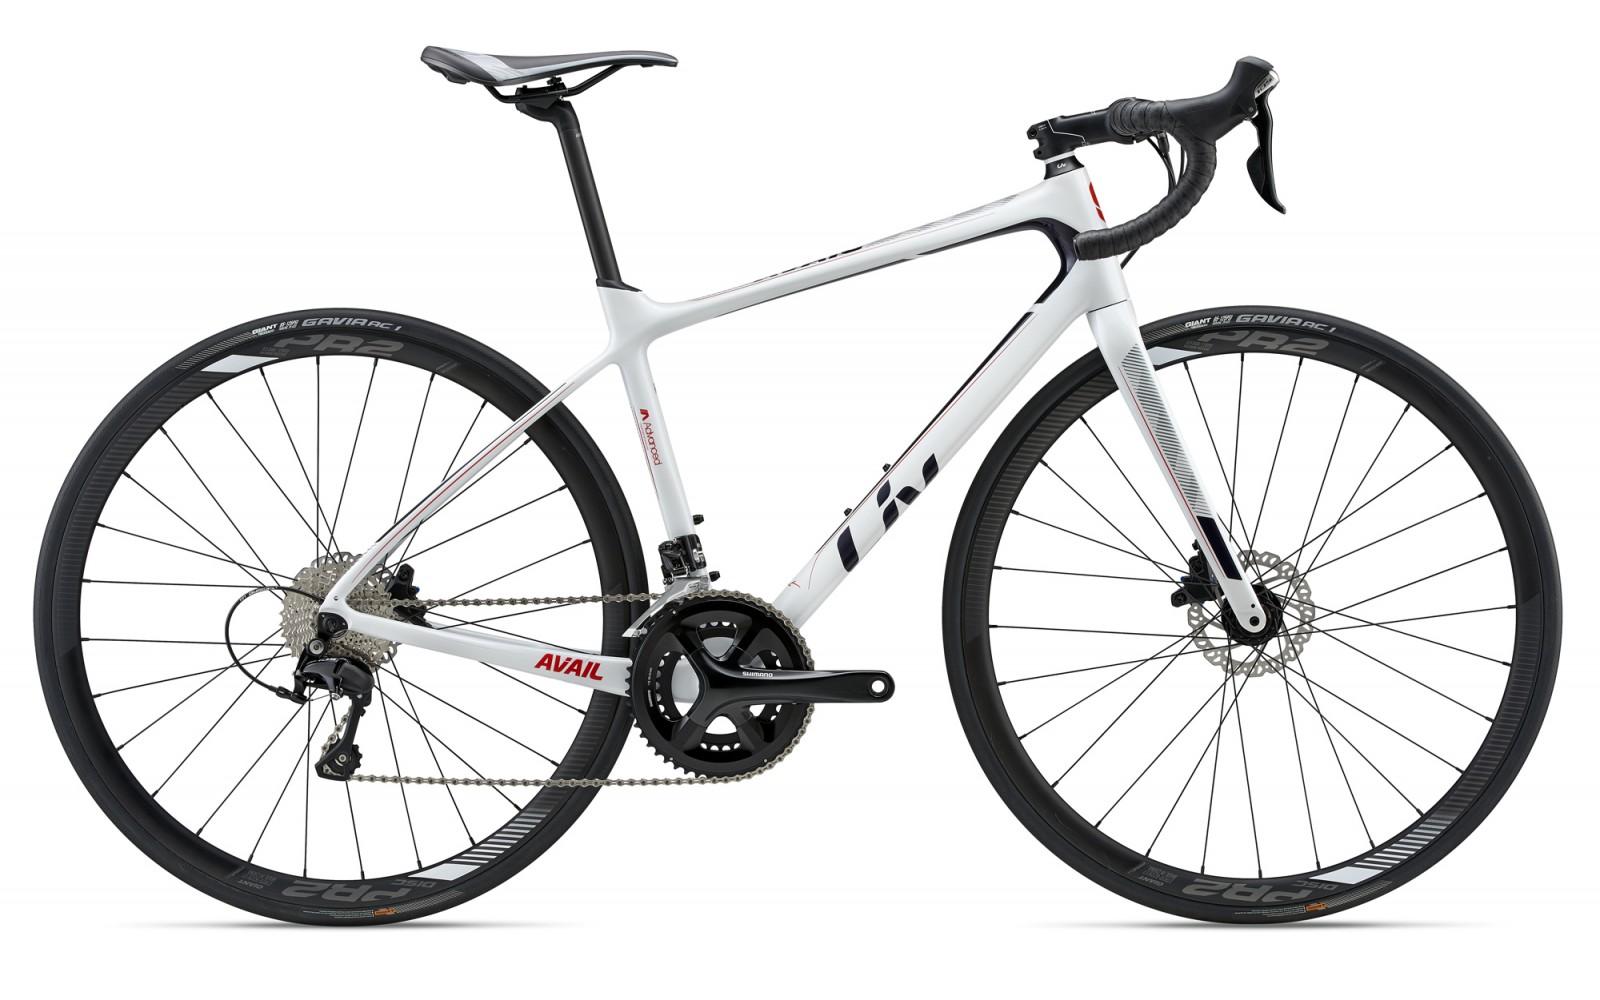 Шоссейный велосипед Giant Avail Advanced 2 (2018)